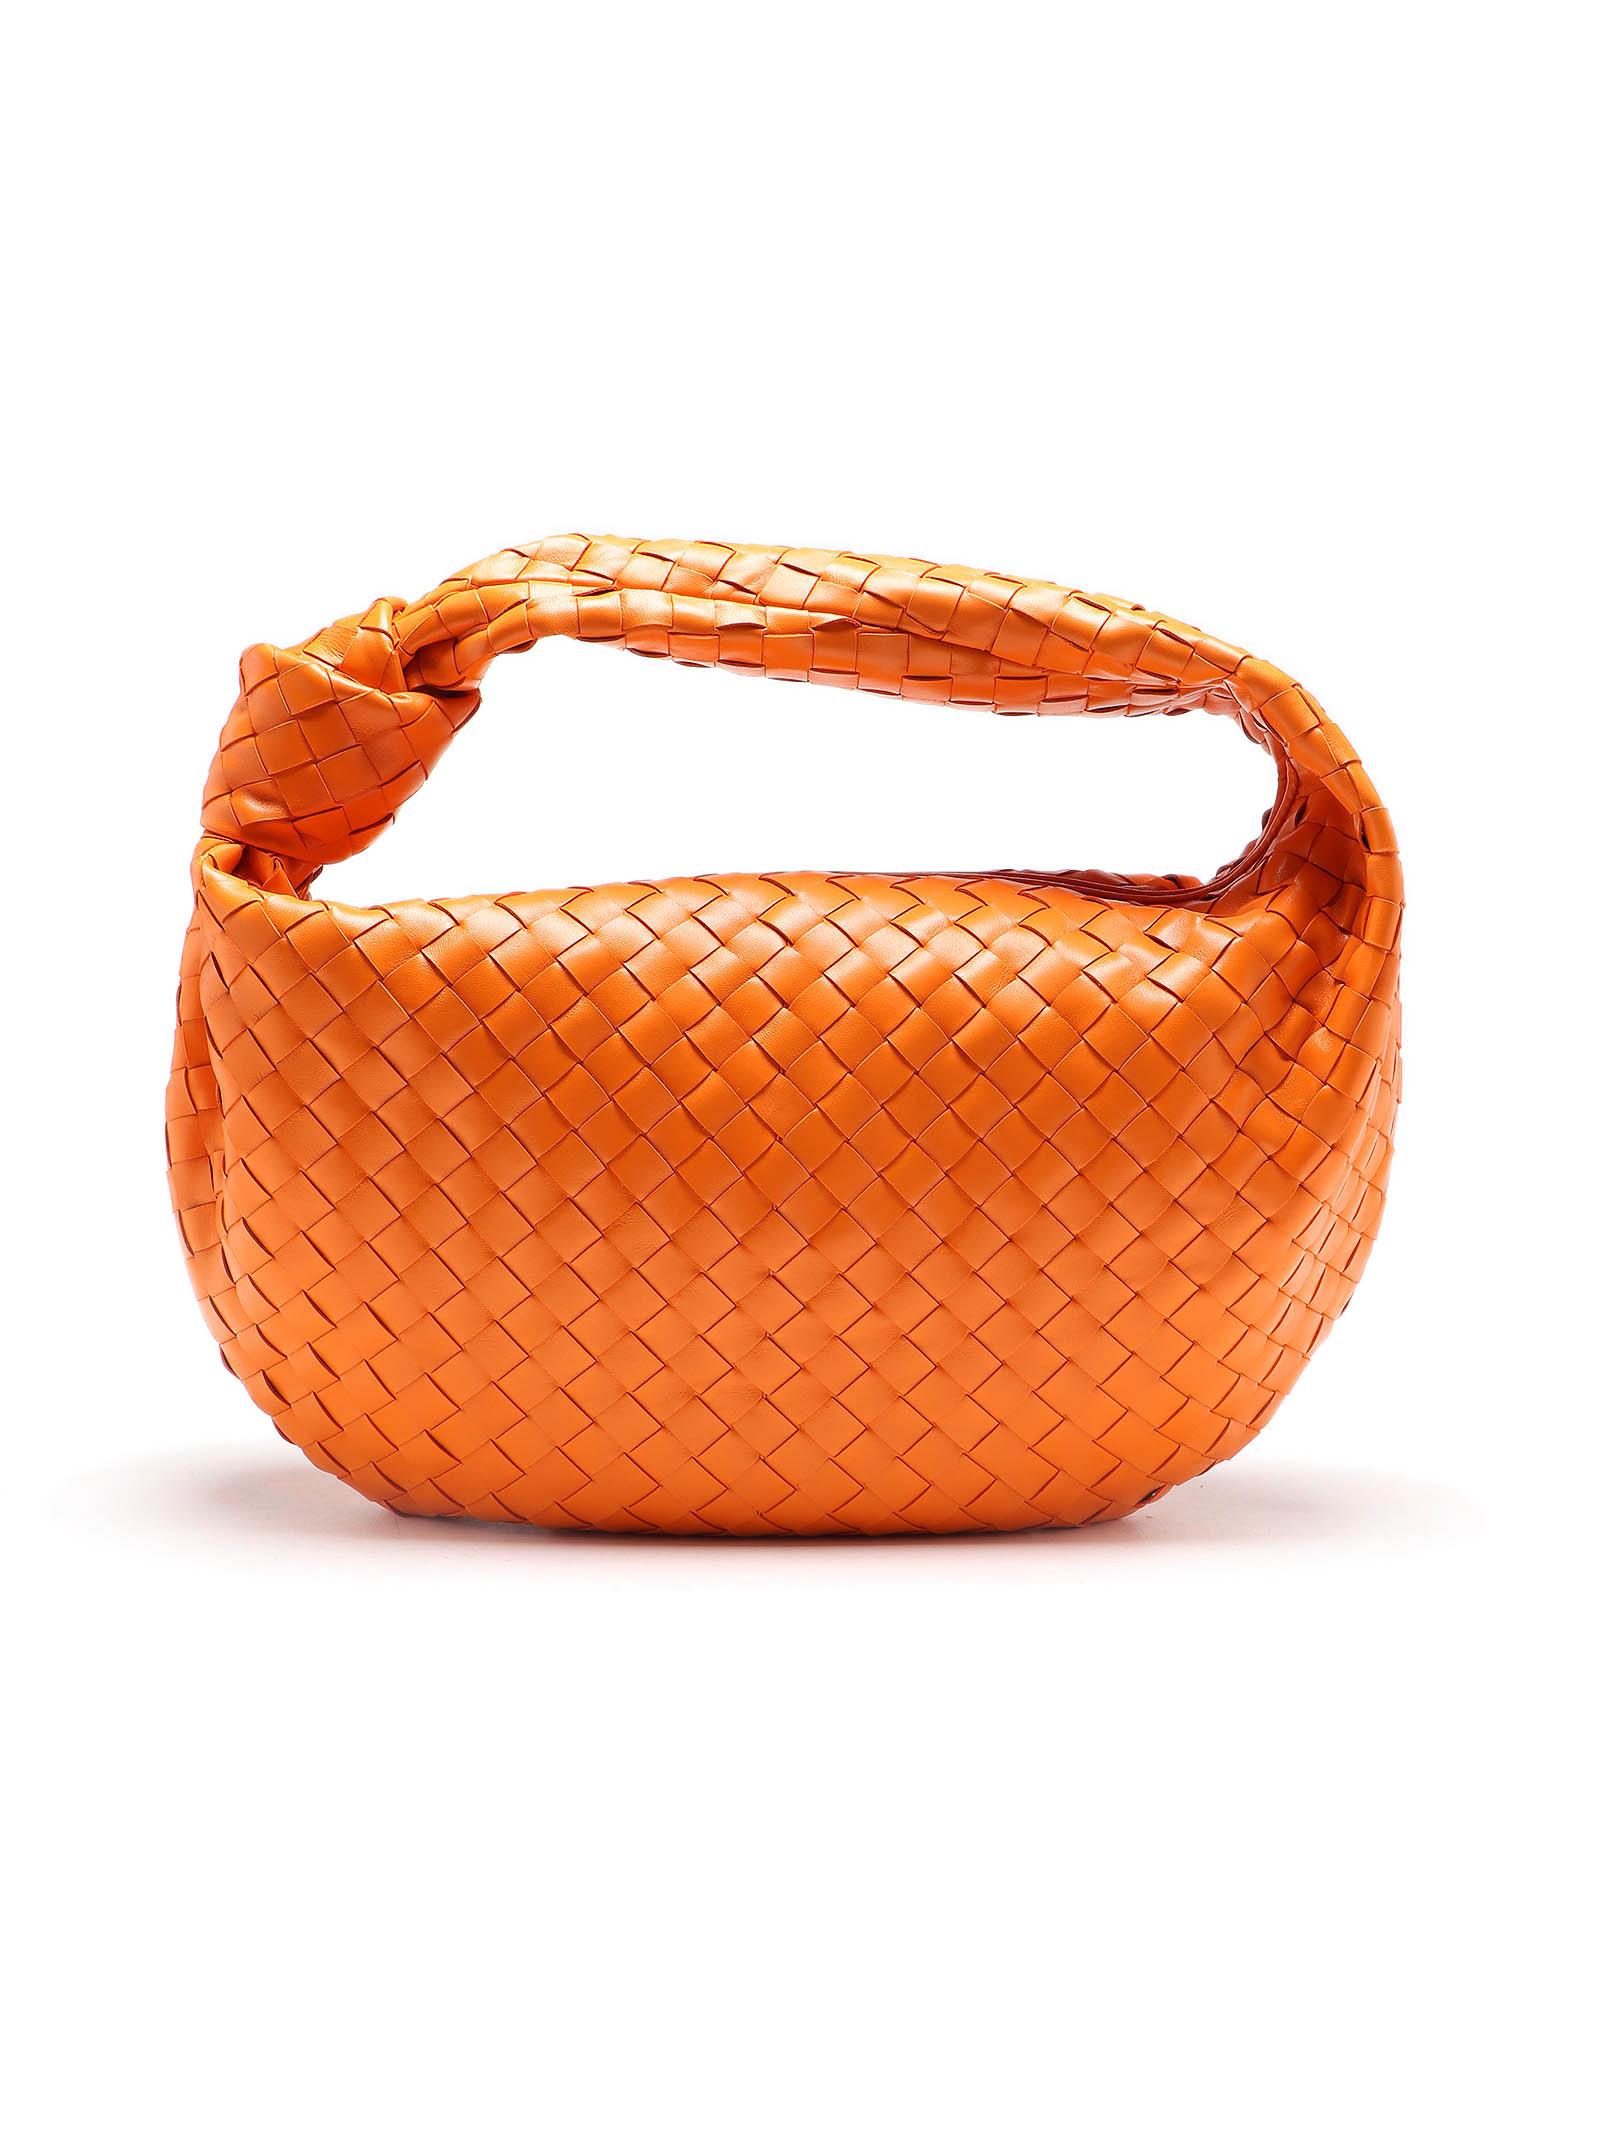 Picture of Bottega Veneta | Jodie Small Bag